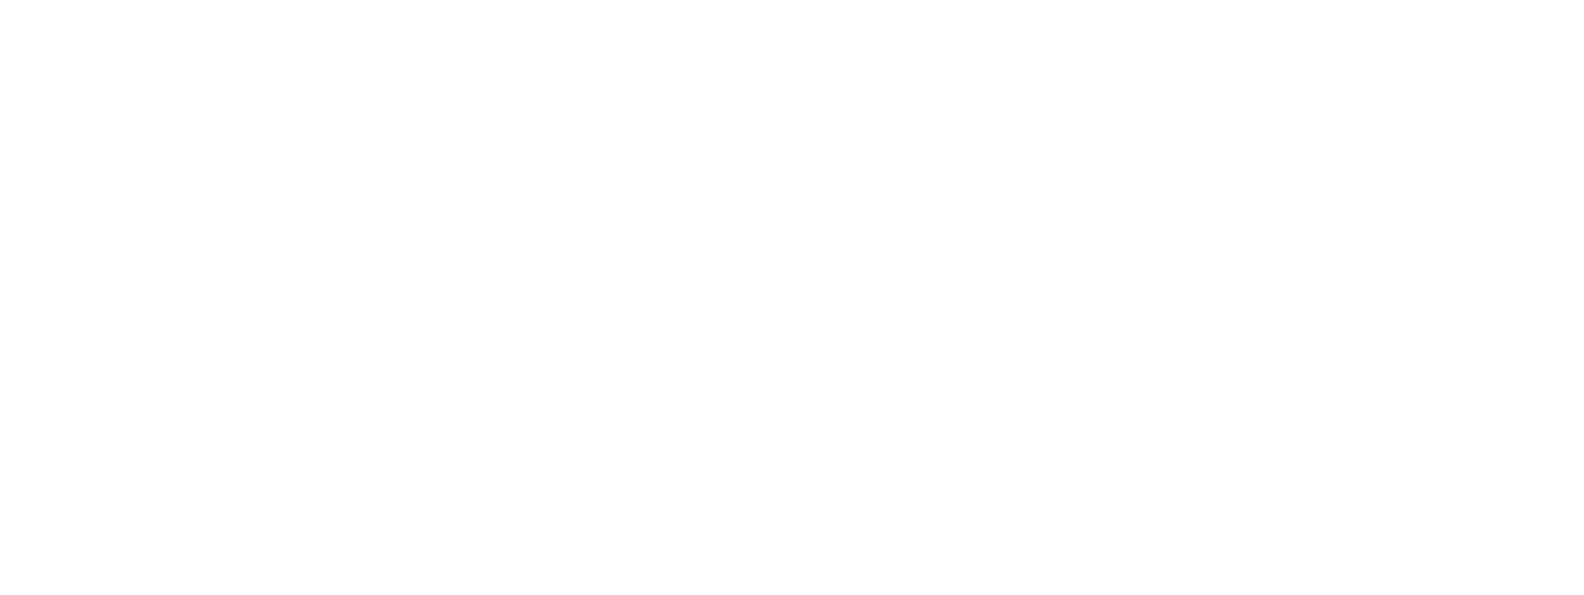 AJMC Managed Markets Network logo knockout